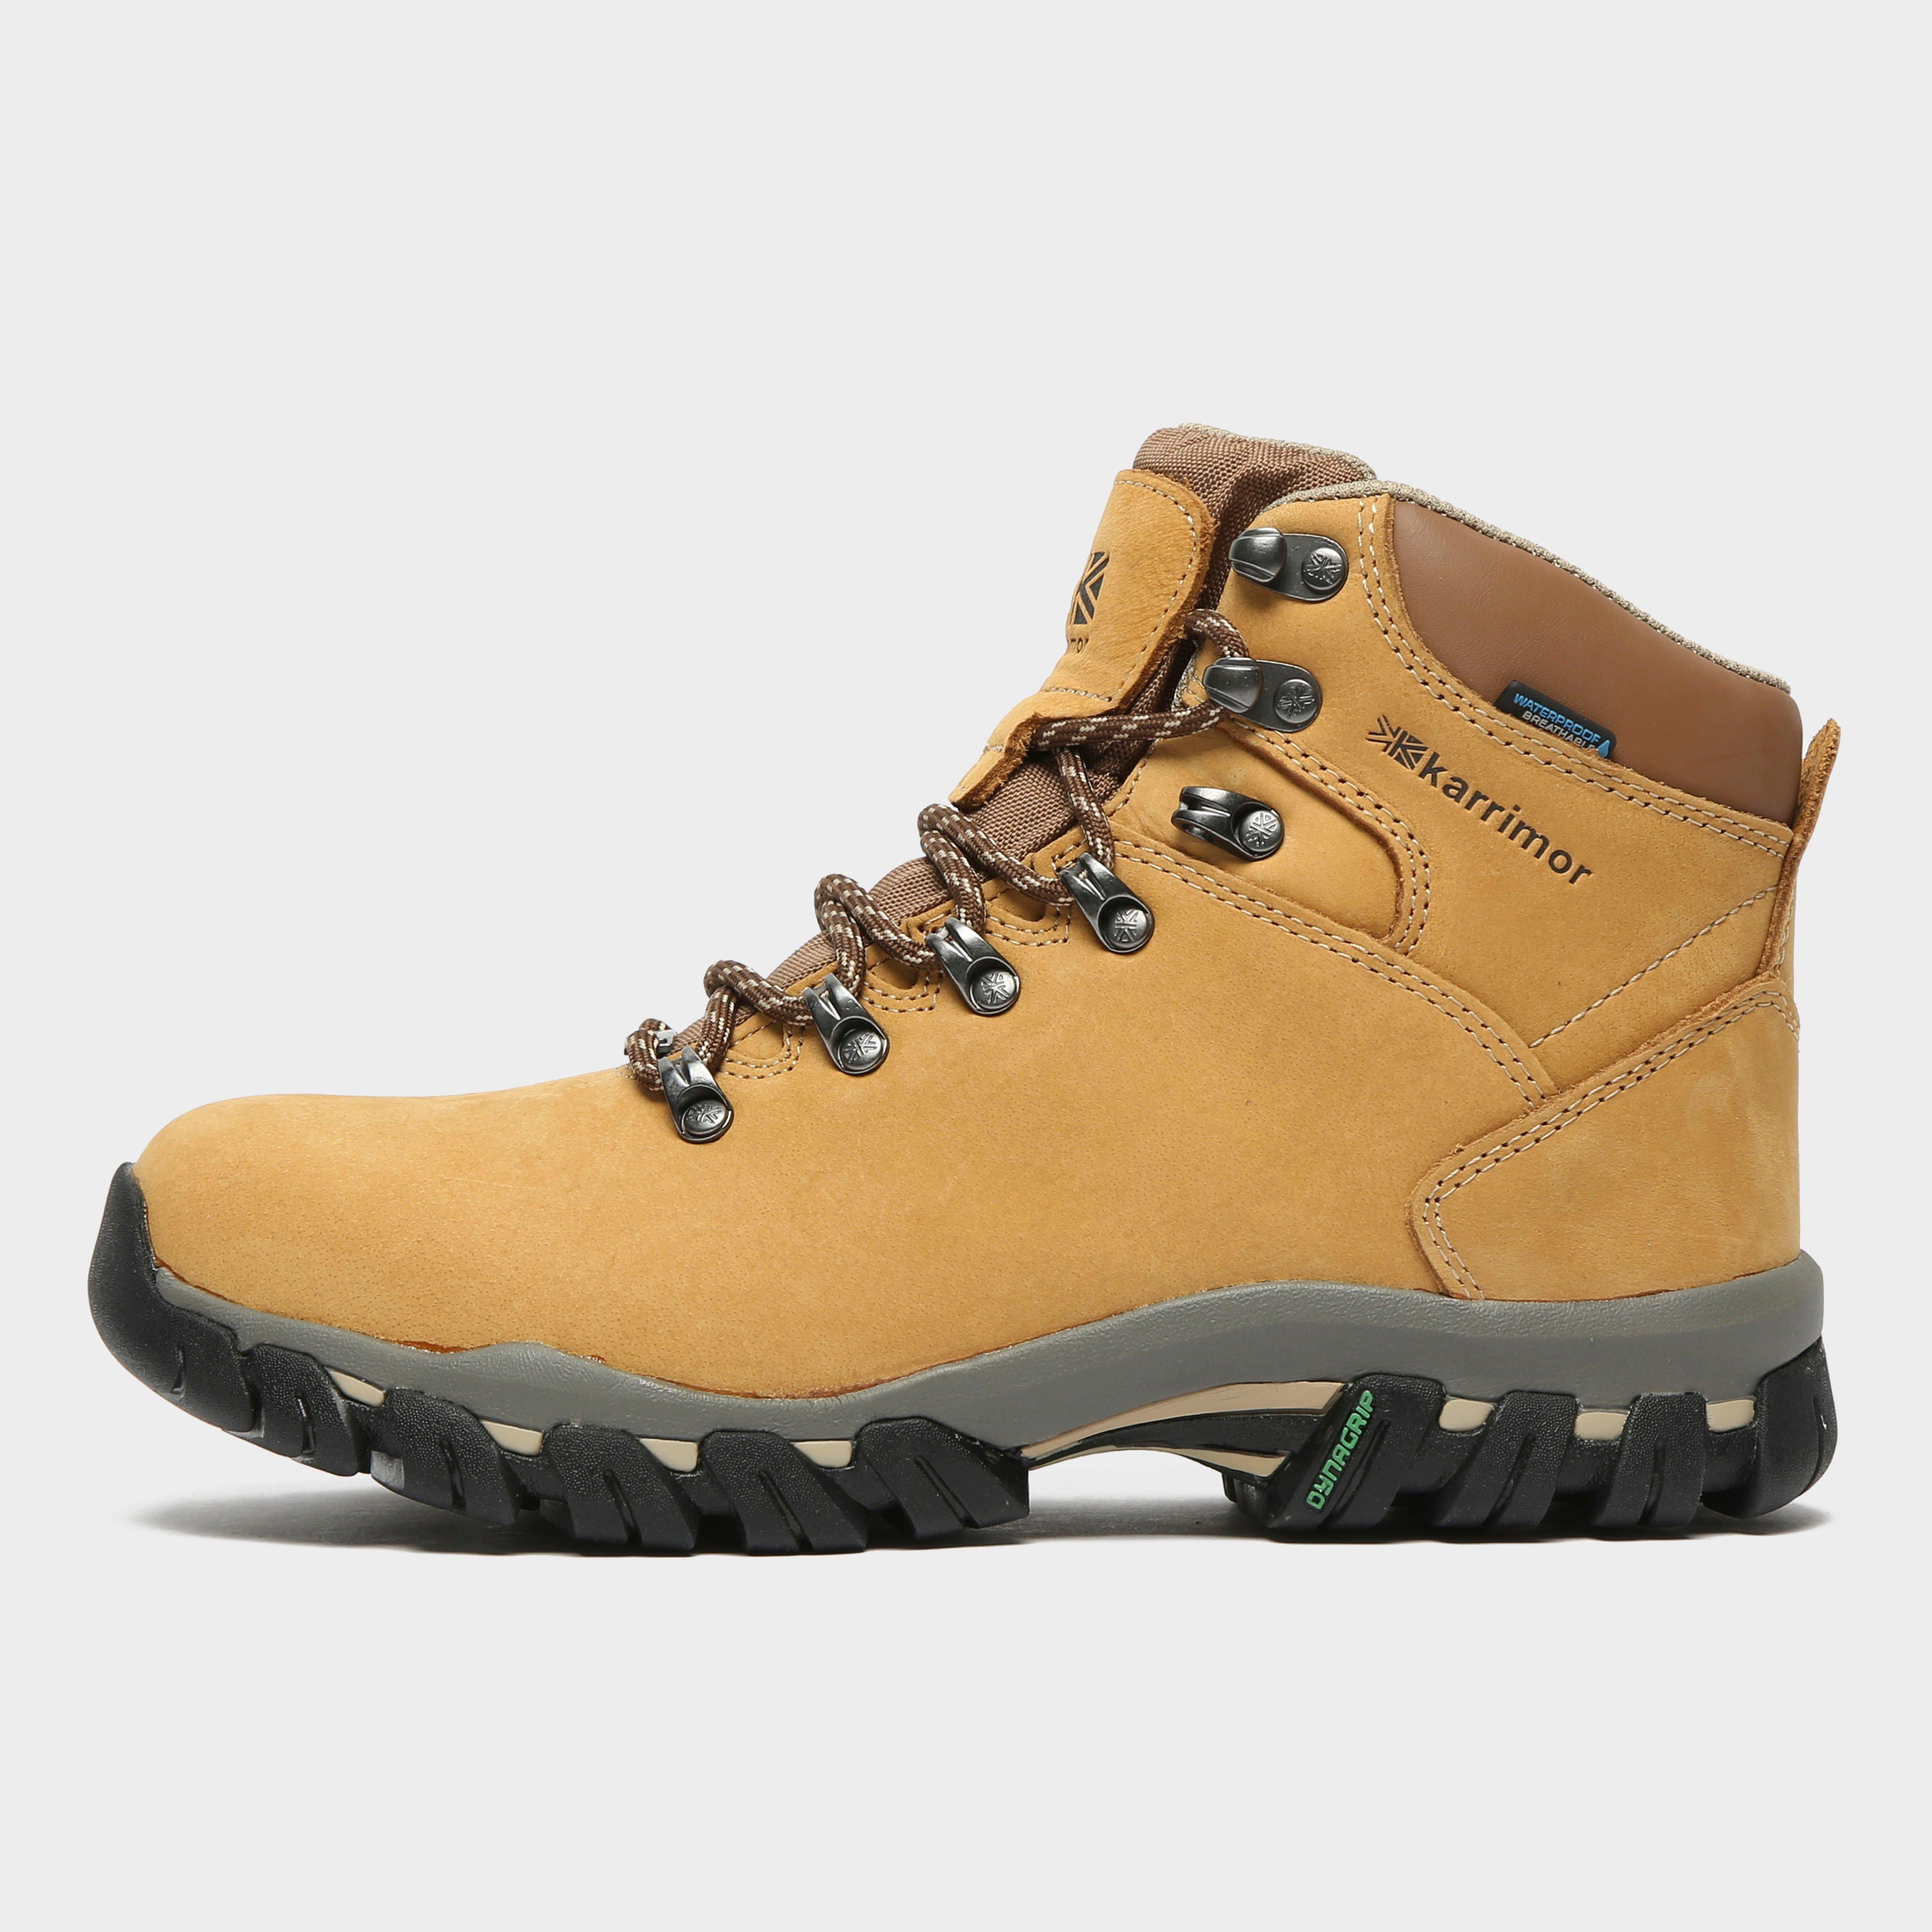 Karrimor Karrimor Womens Mendip 3 NB Walking Boots